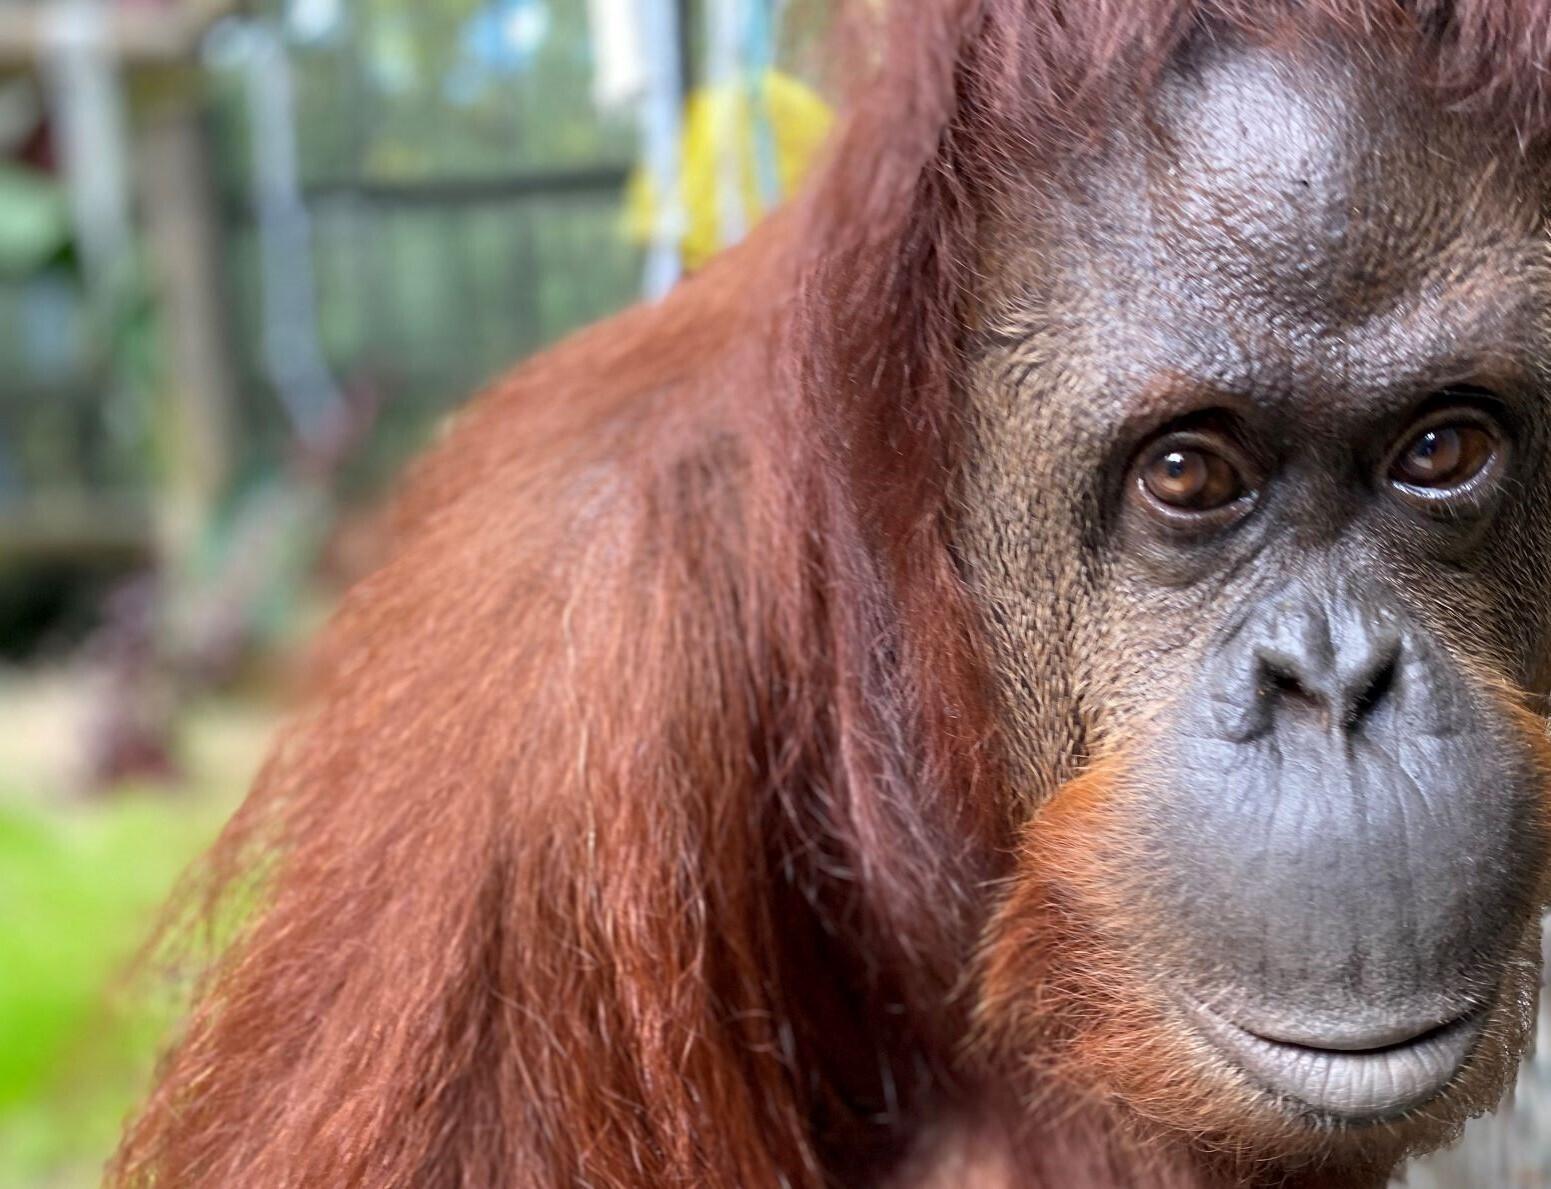 Orangutan granted legal personhood moves to Florida